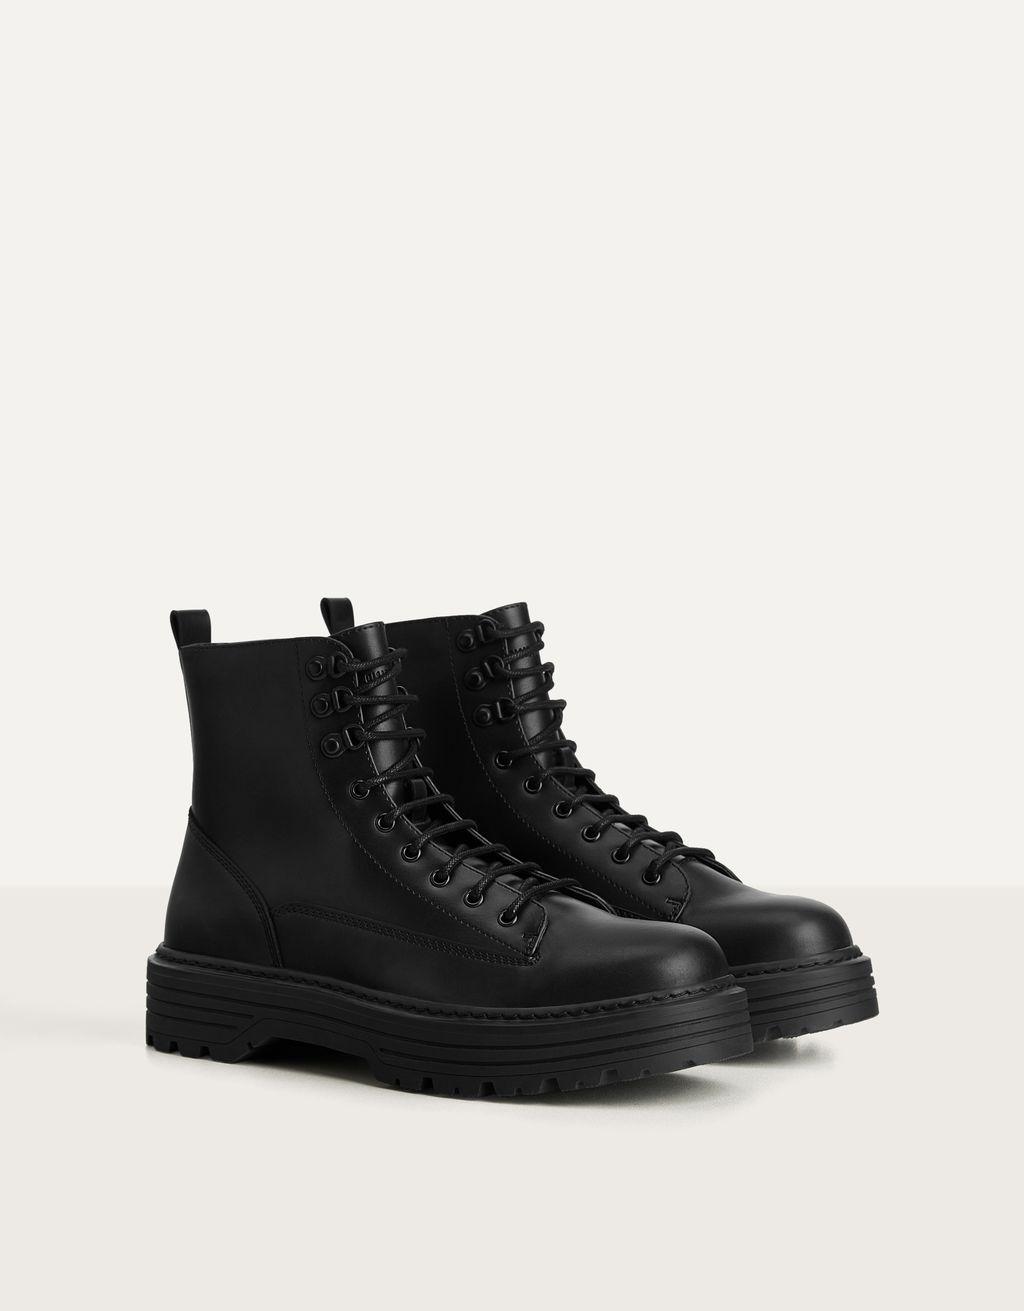 lace-up boots - Shoes - Bershka Venezuela